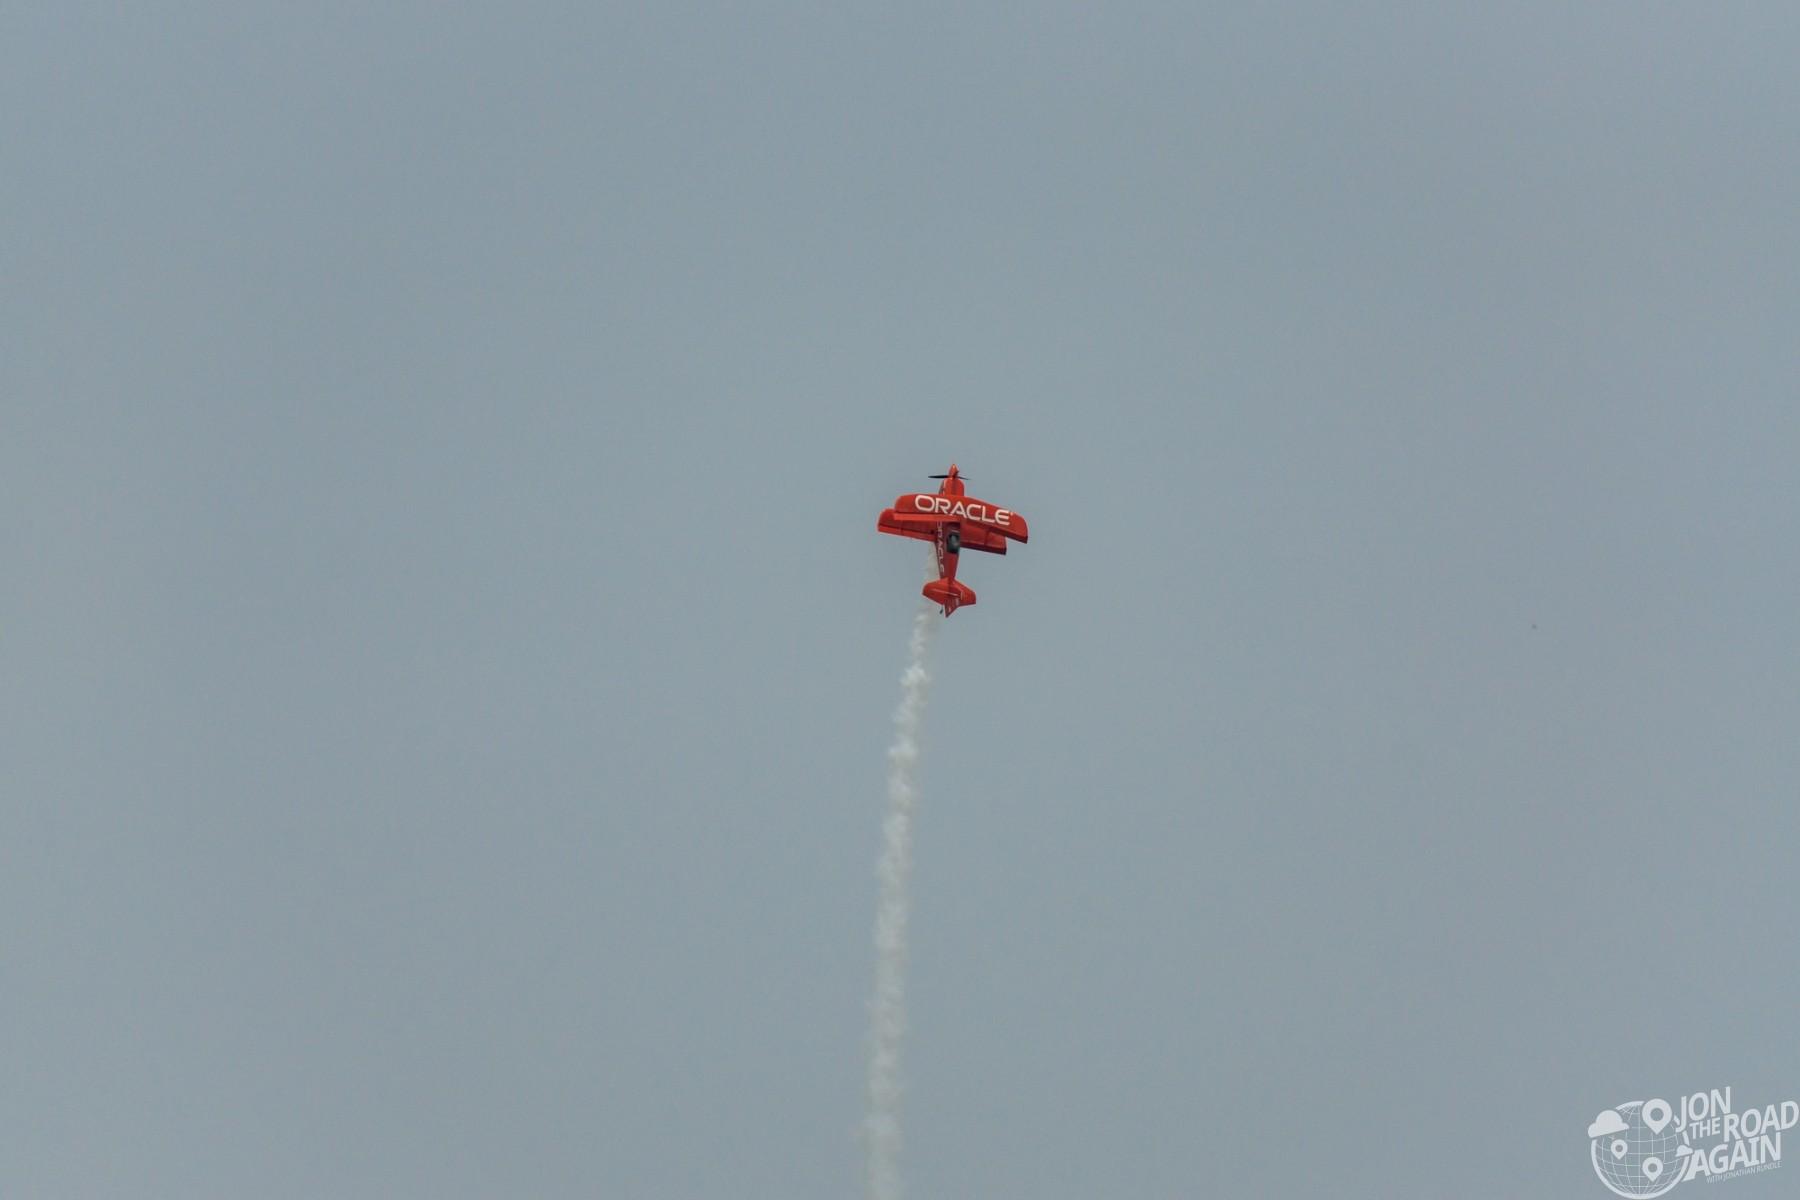 Seafair Oracle Bi-plane